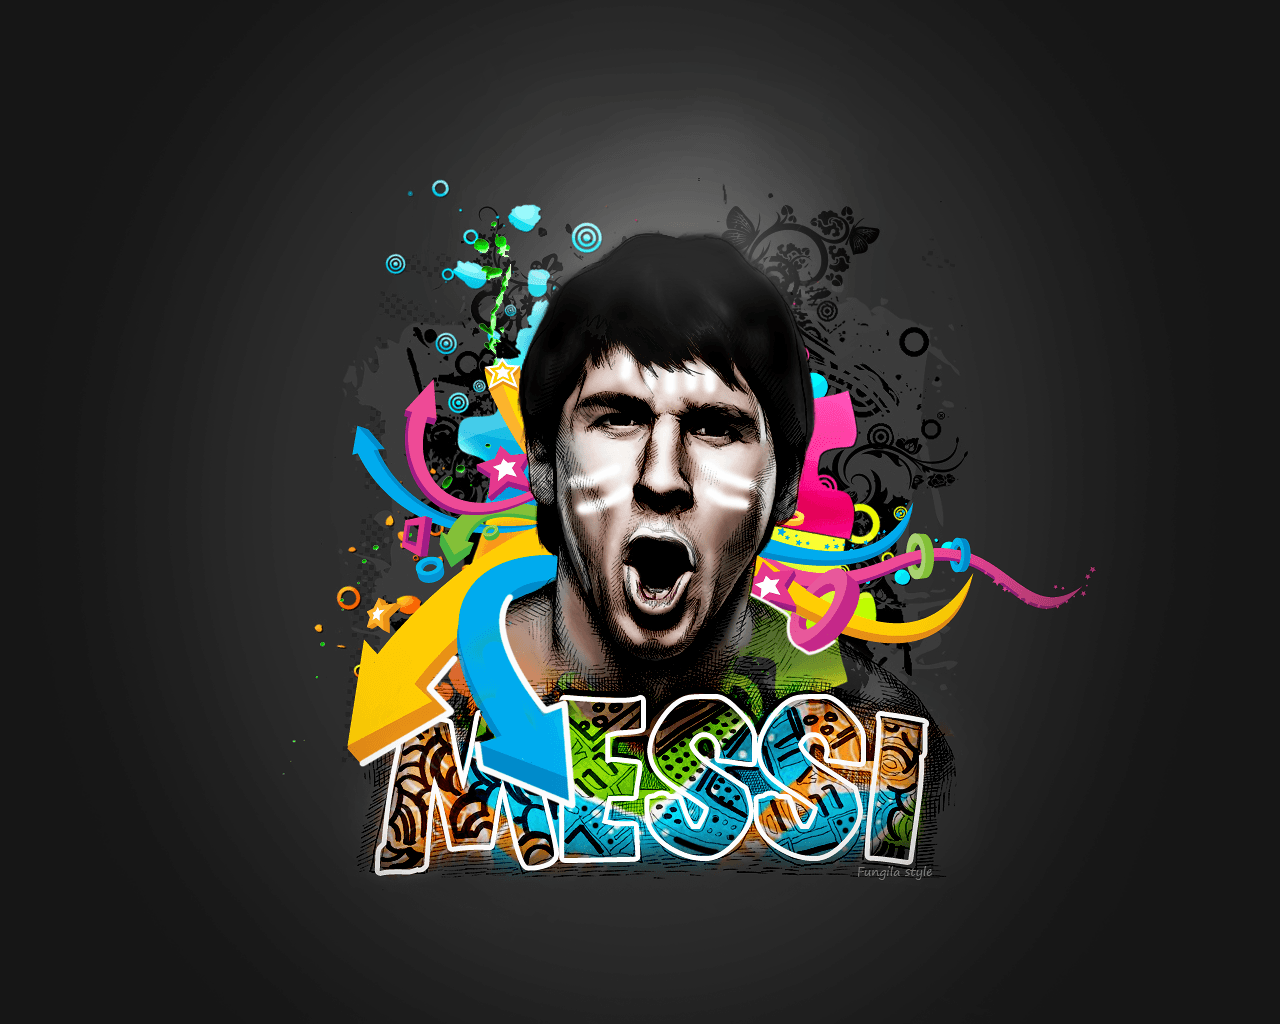 Messi Wallpapers HD - Wallpaper Cave